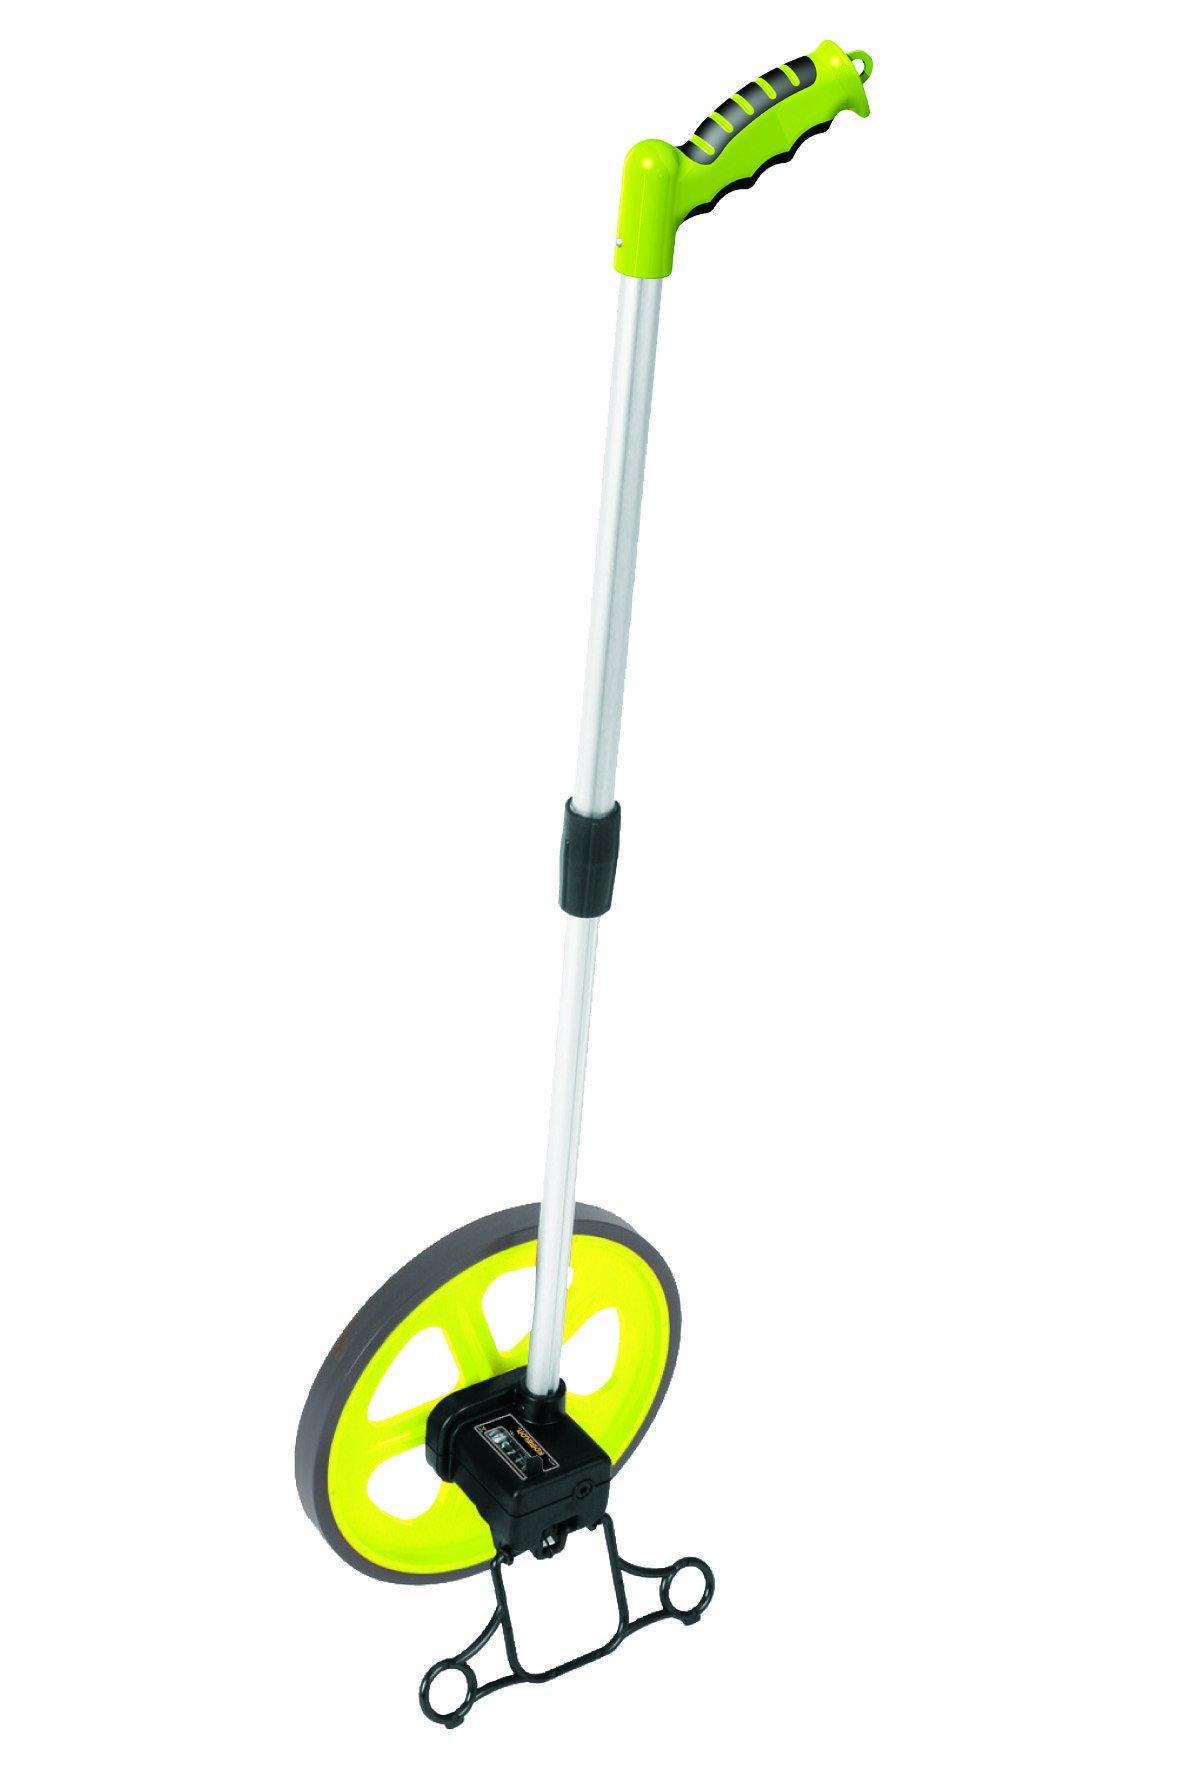 Mutual 17701 W31 Series Komelon Mechanical Measuring Wheel with Kickstand, 10'' Diameter, Feet/Inches